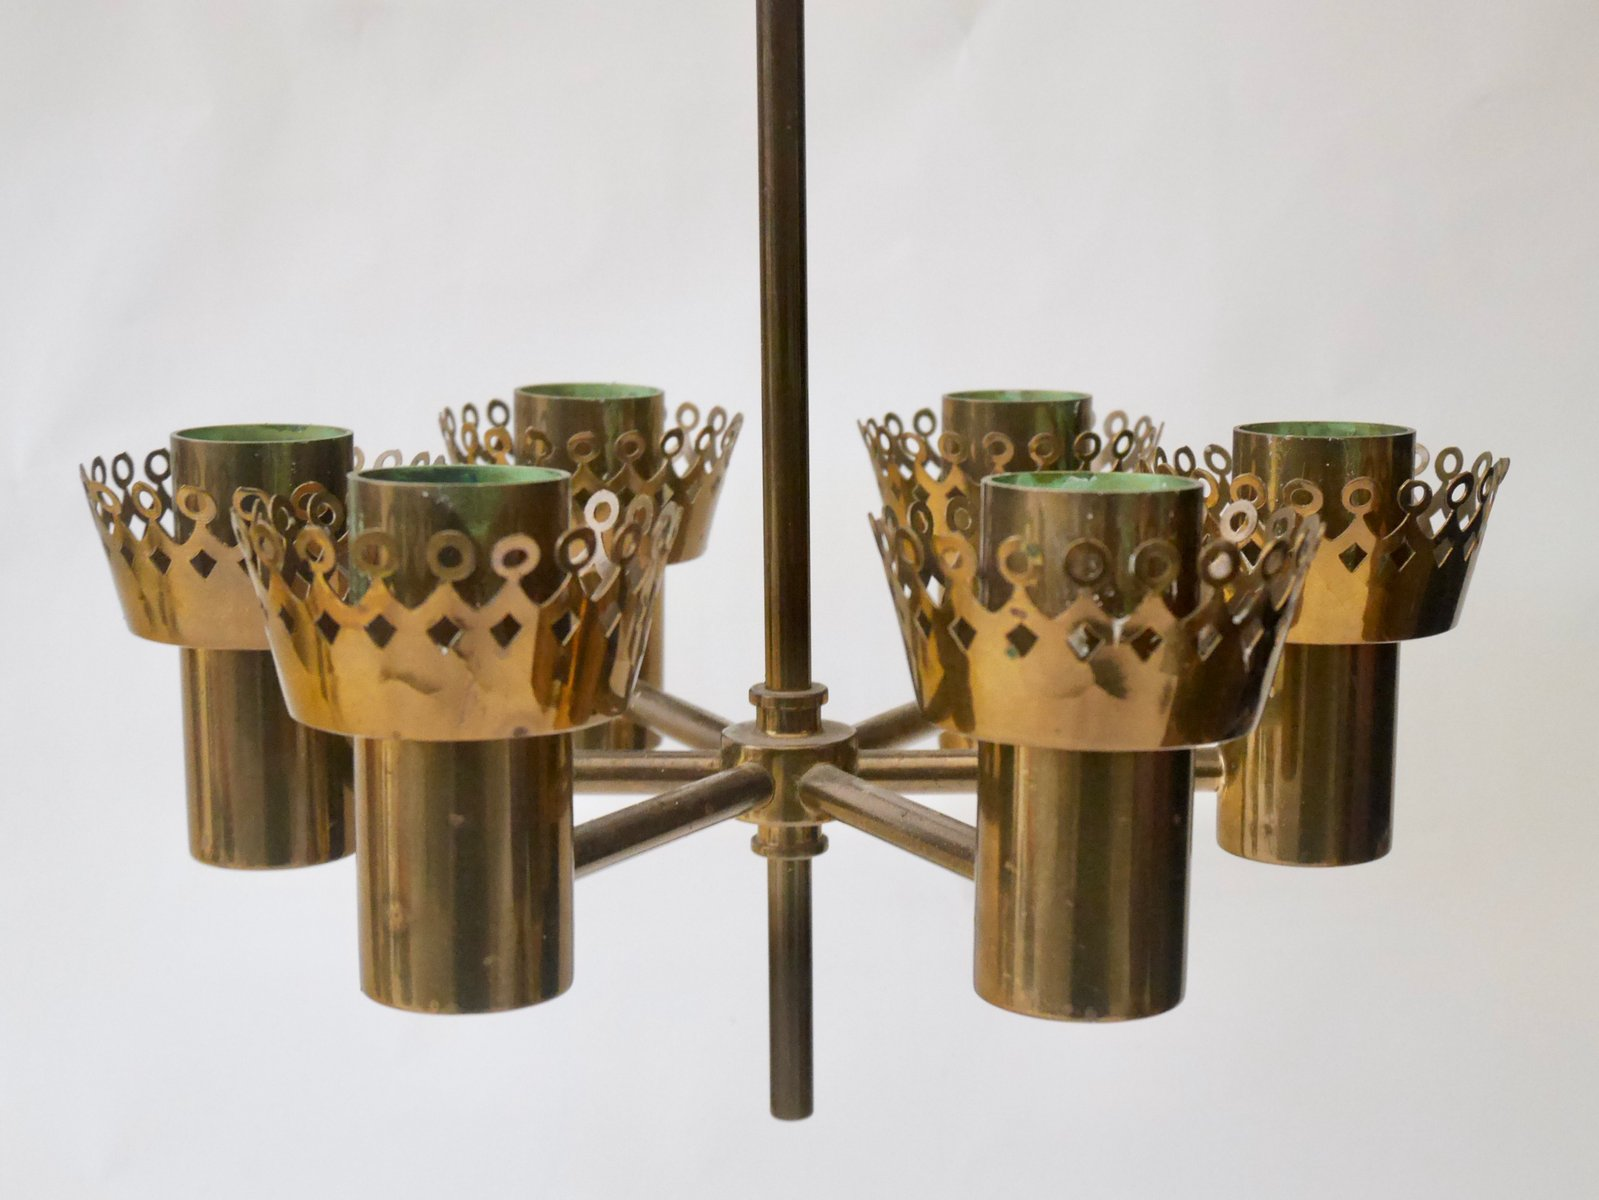 6 connectors 2,4 cm metal color bronze